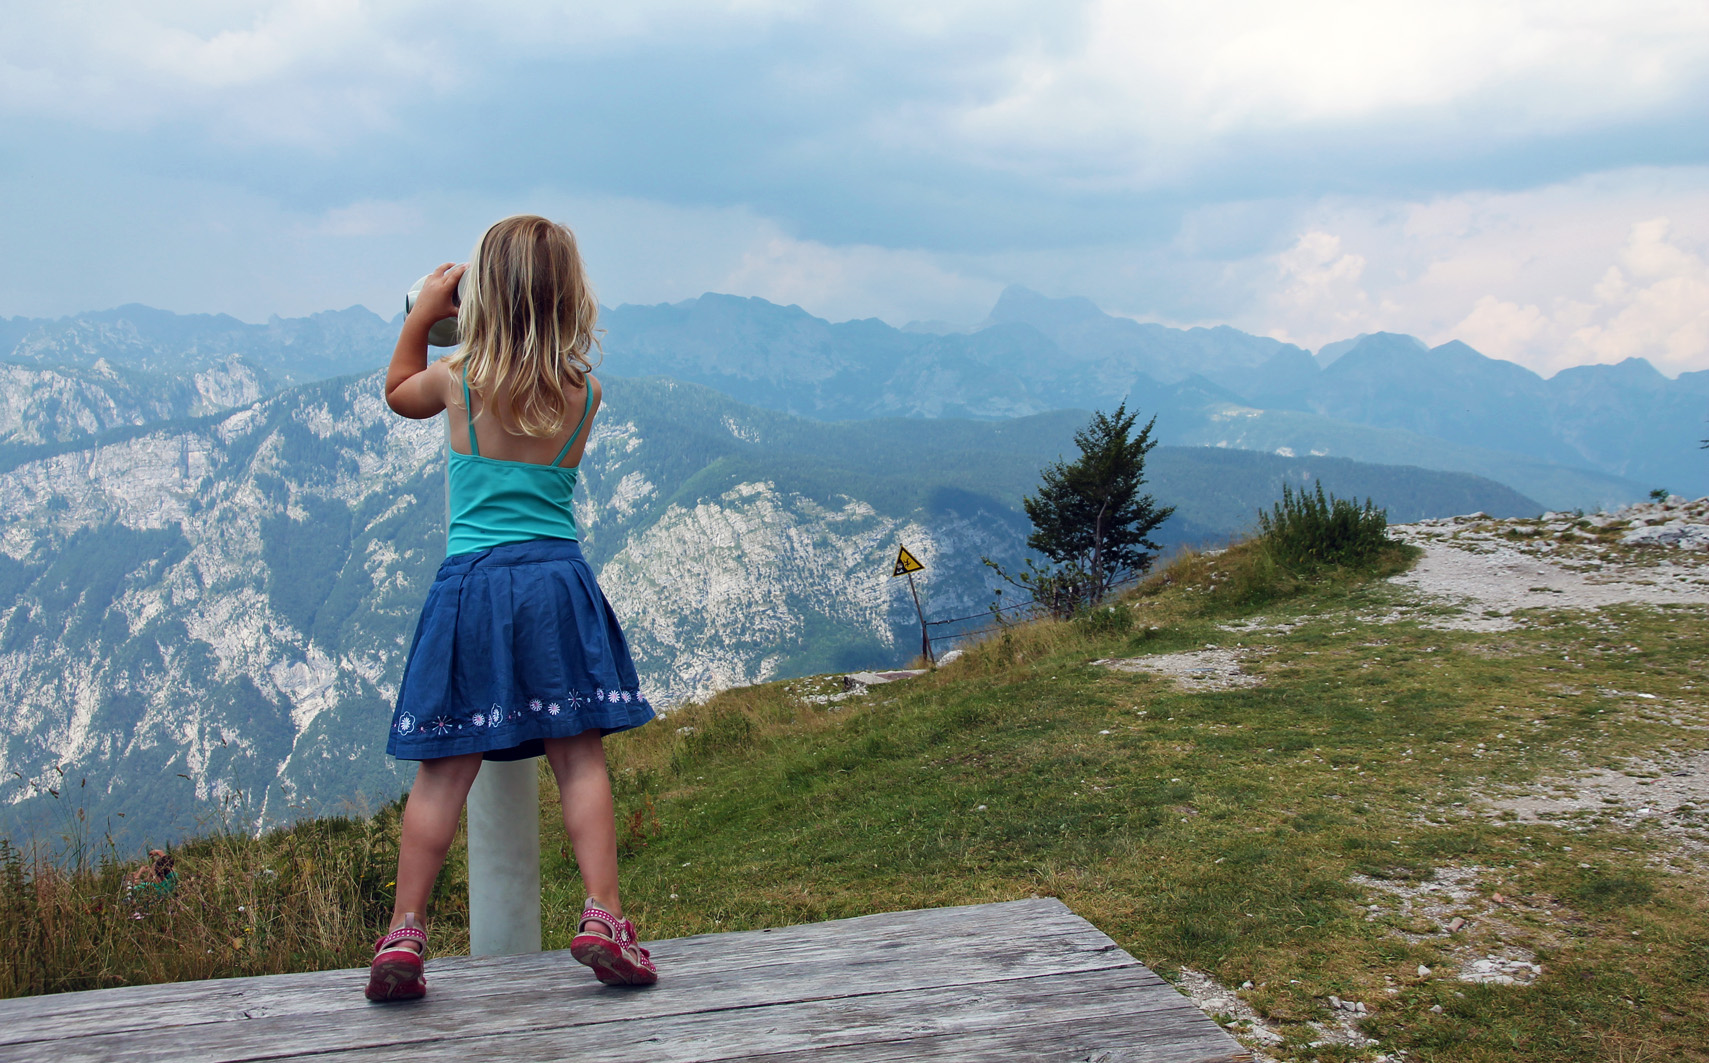 Febe exploring the Alpine environment.